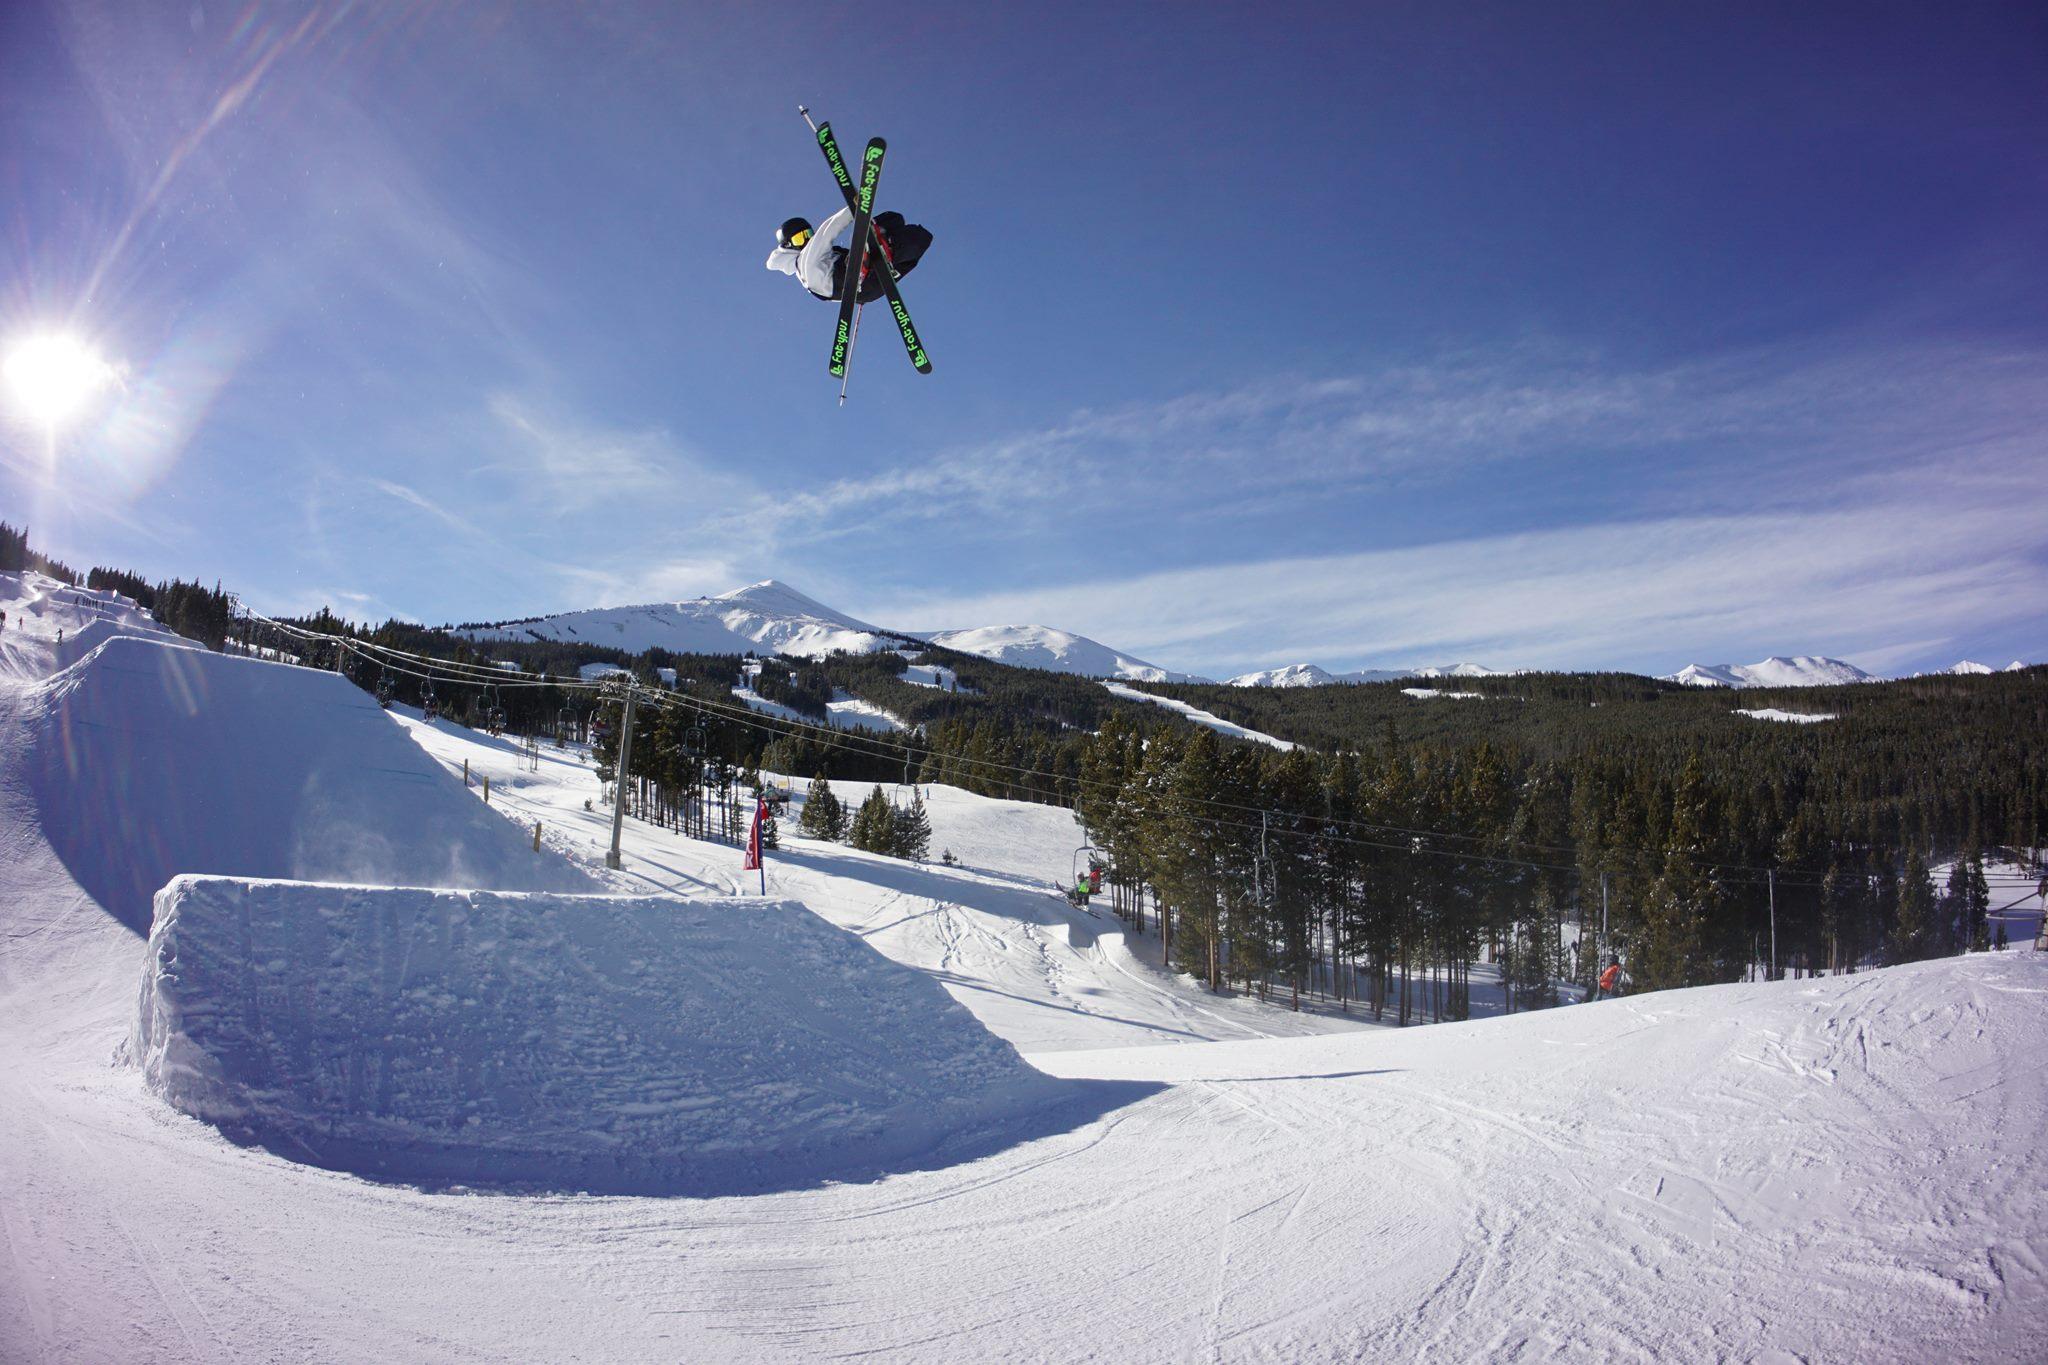 Dane Kirk | Sport